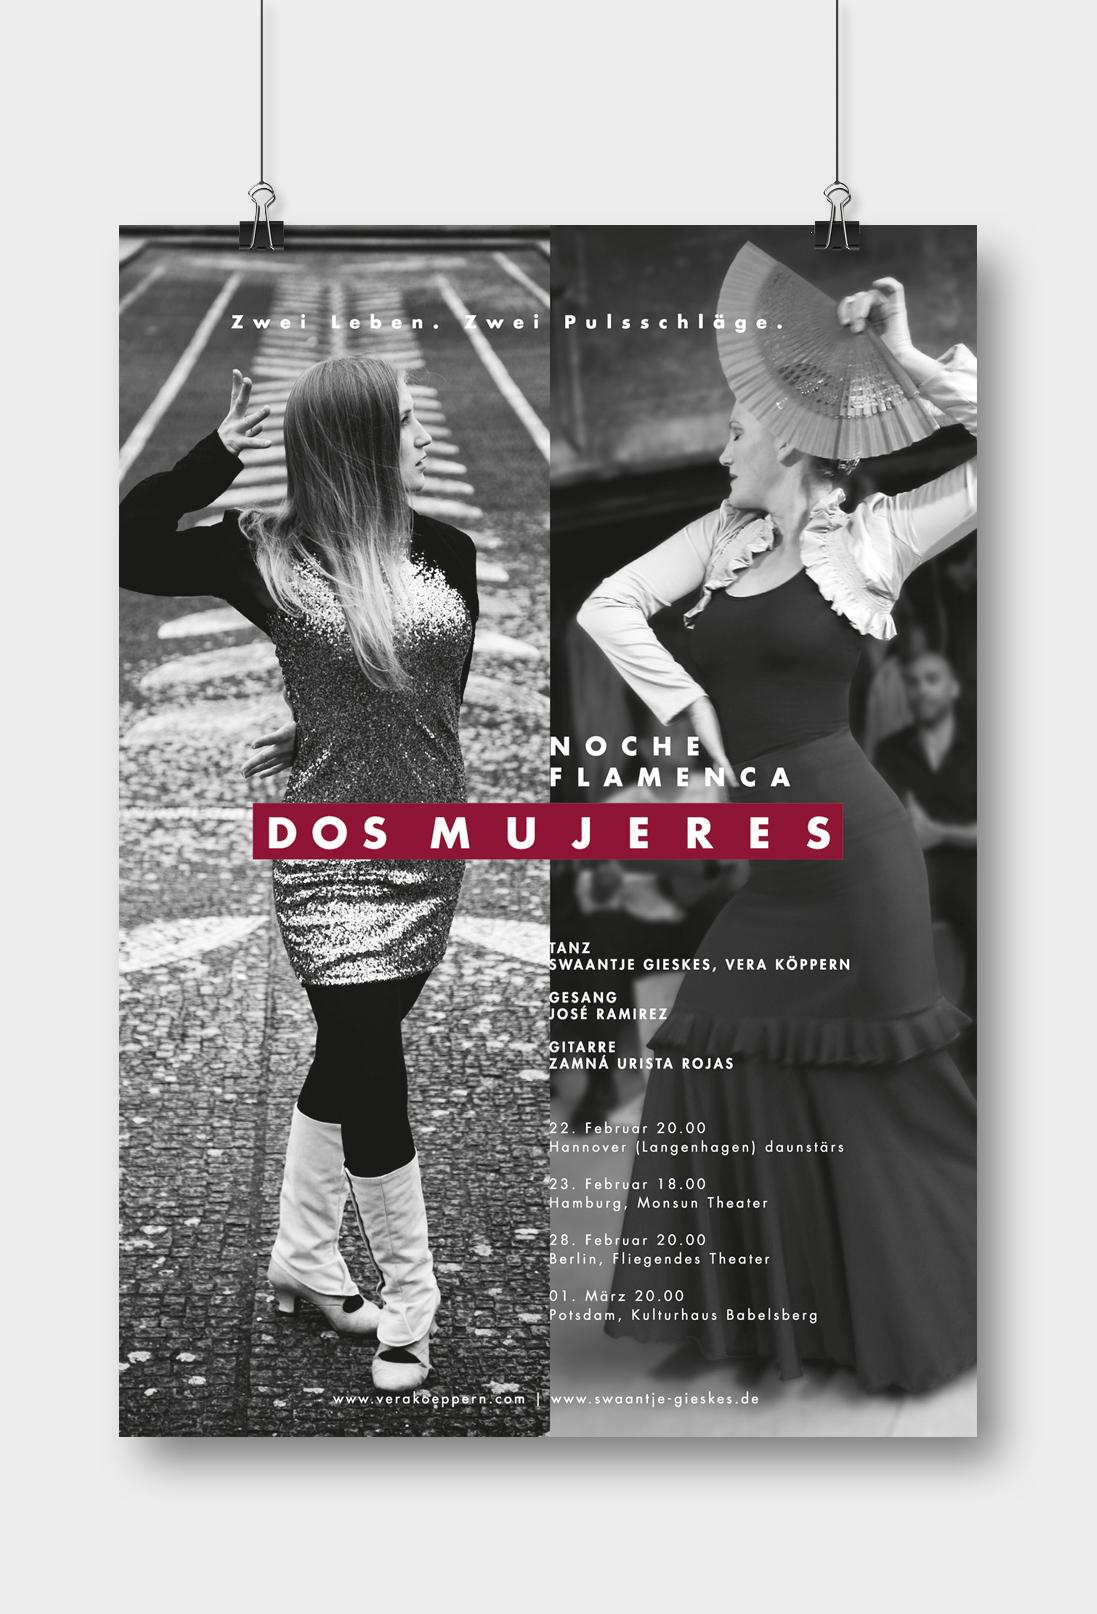 DOS MUJERES – Flamenco performance